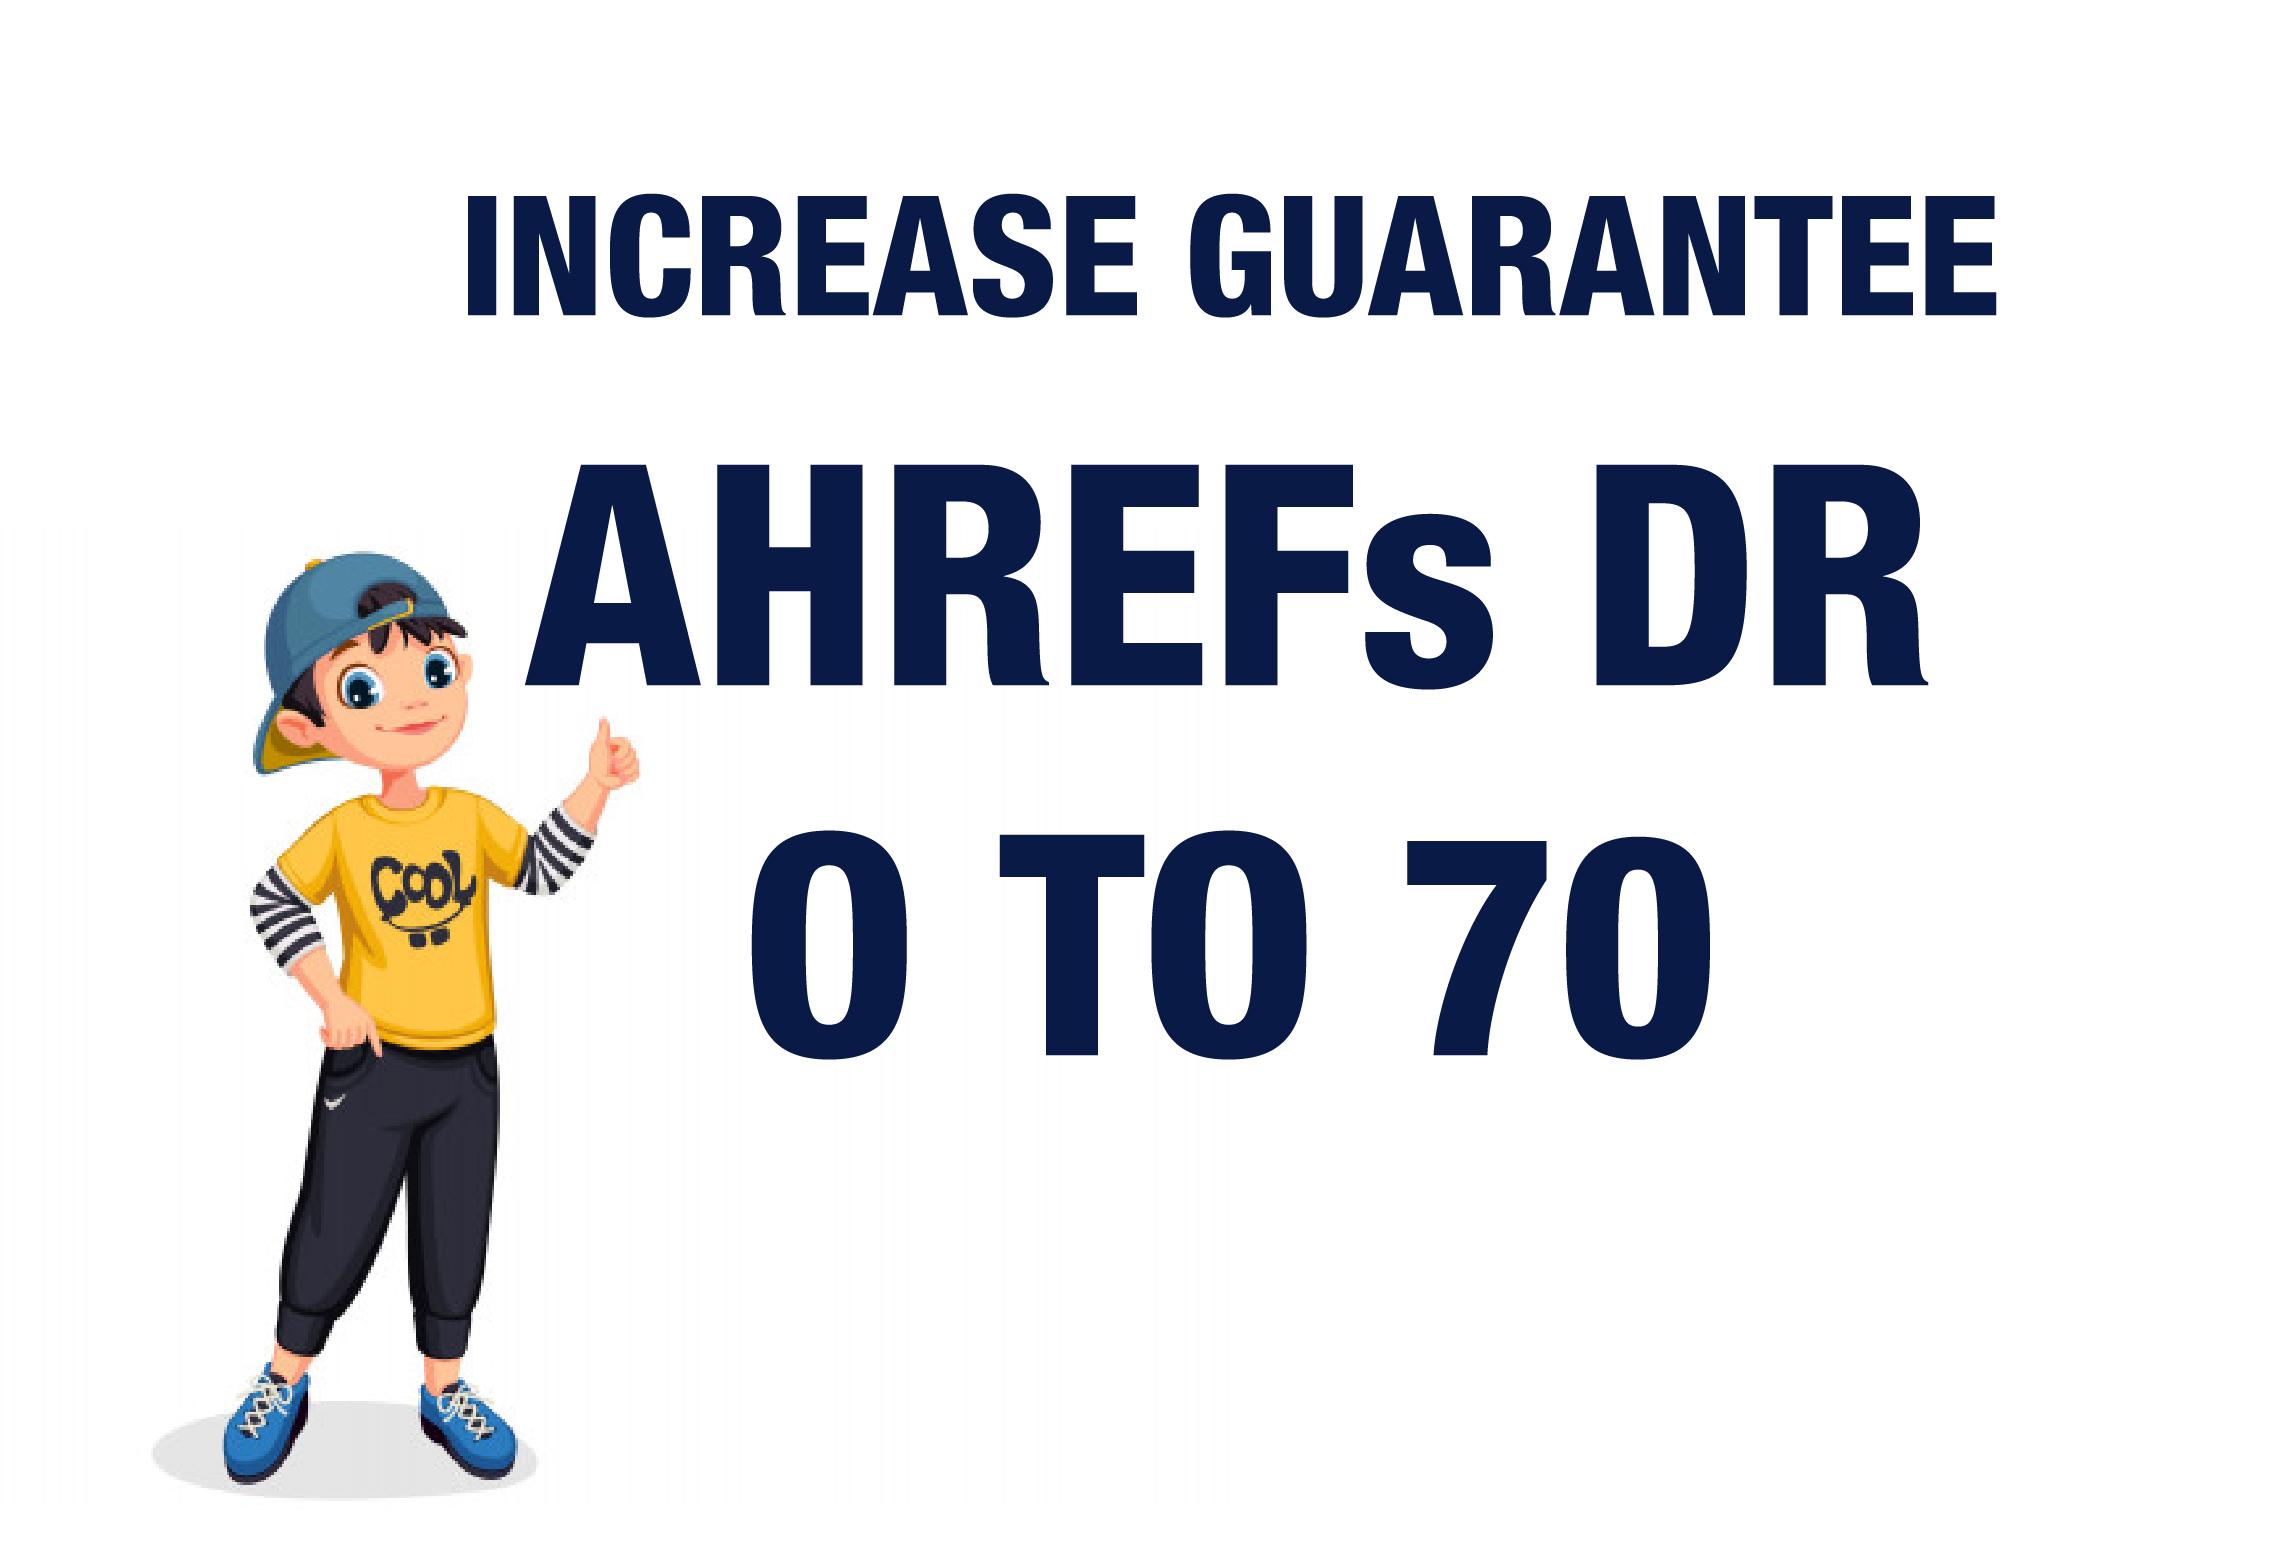 I will increase Aherfs DR 70 Increase Guarantee